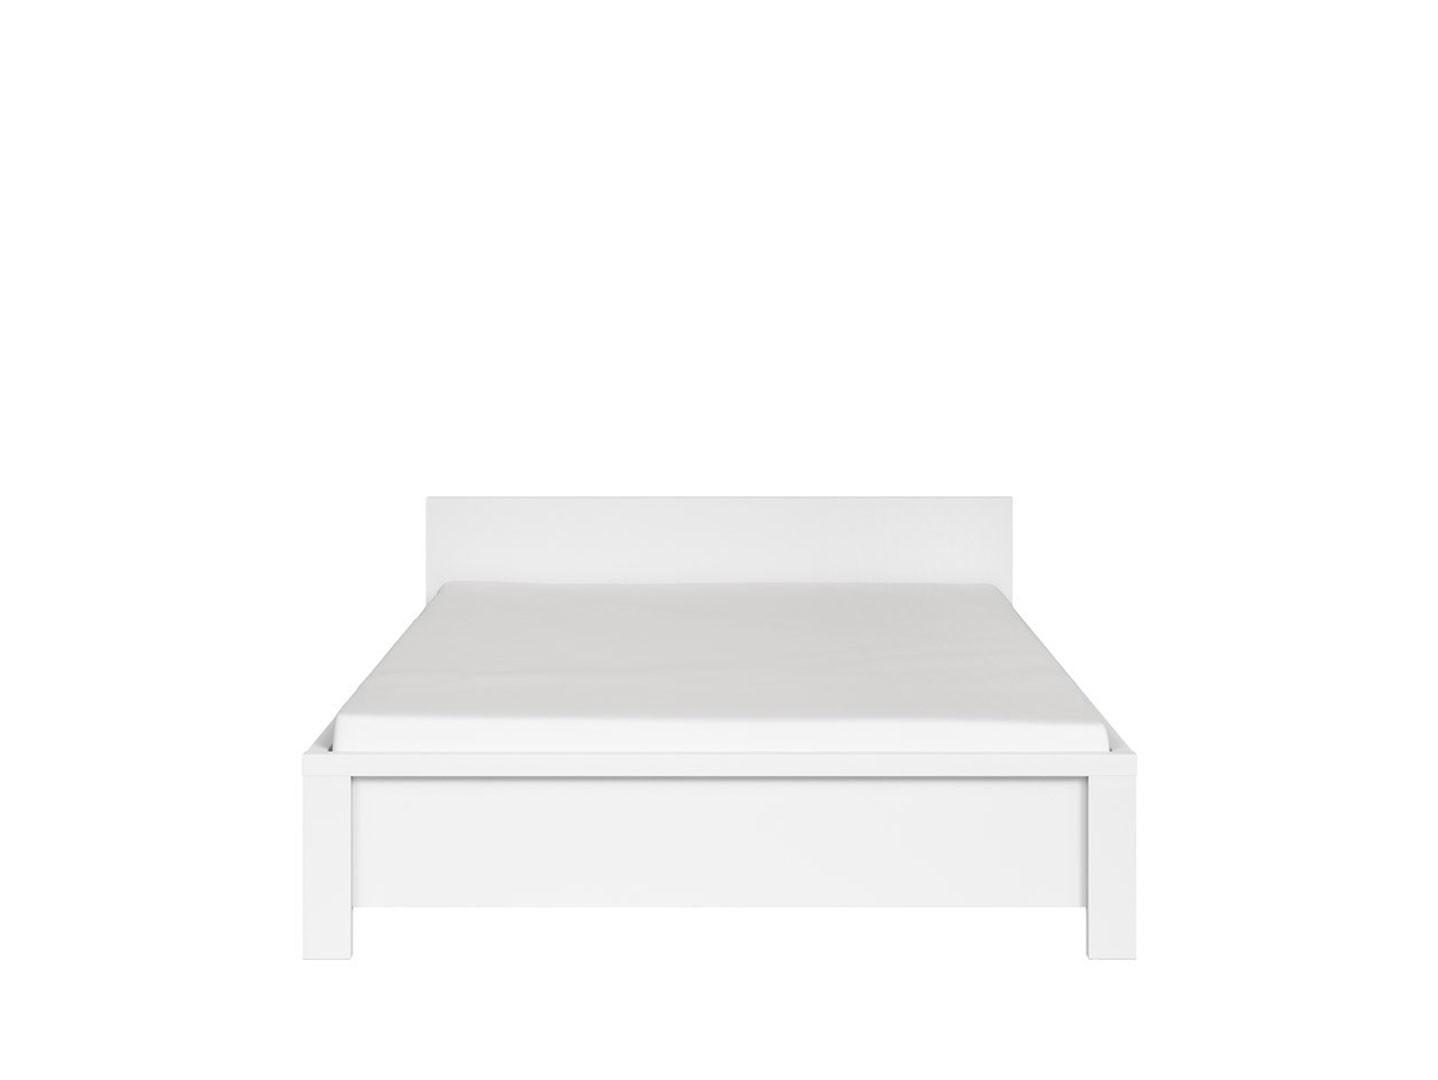 Manželská postel 140 cm - BRW - Kaspian - LOZ/140 (bílá)